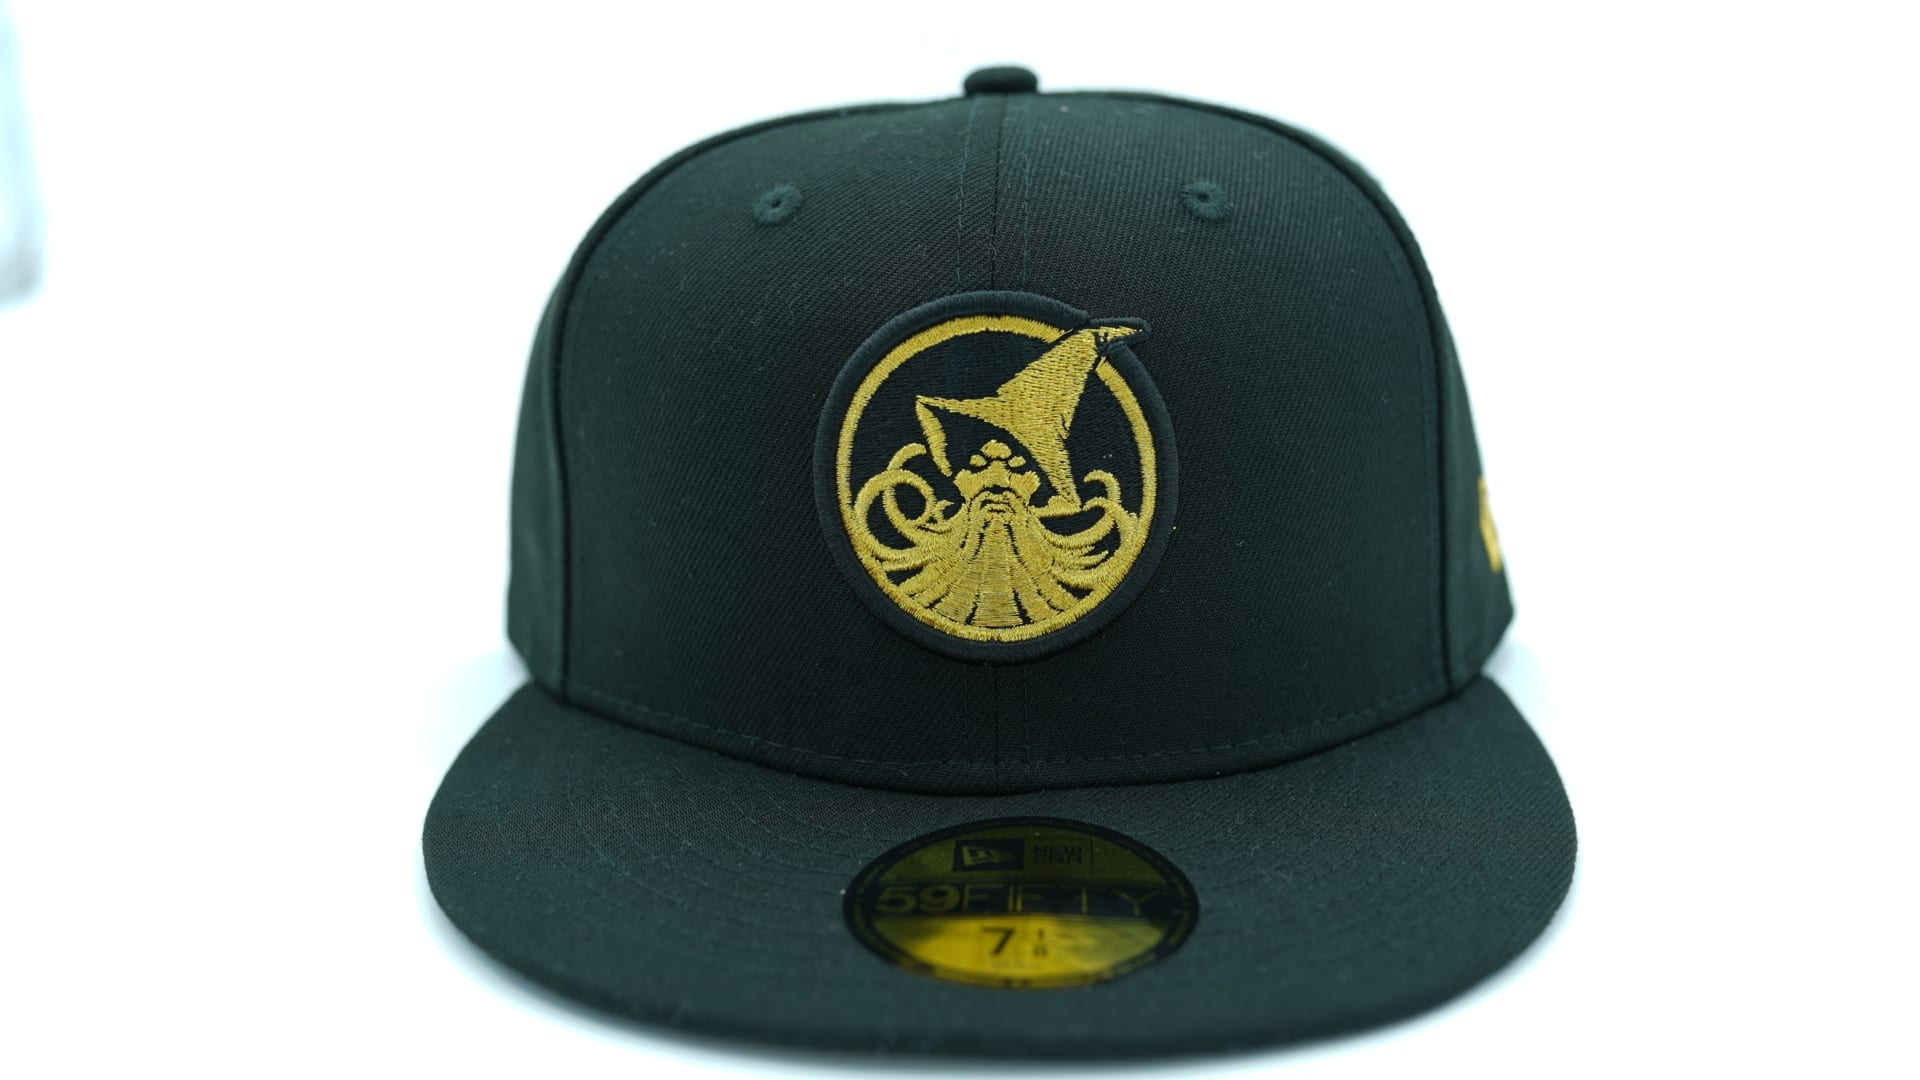 new era ask any pro metallic gold 59fifty fitted baseball cap new era